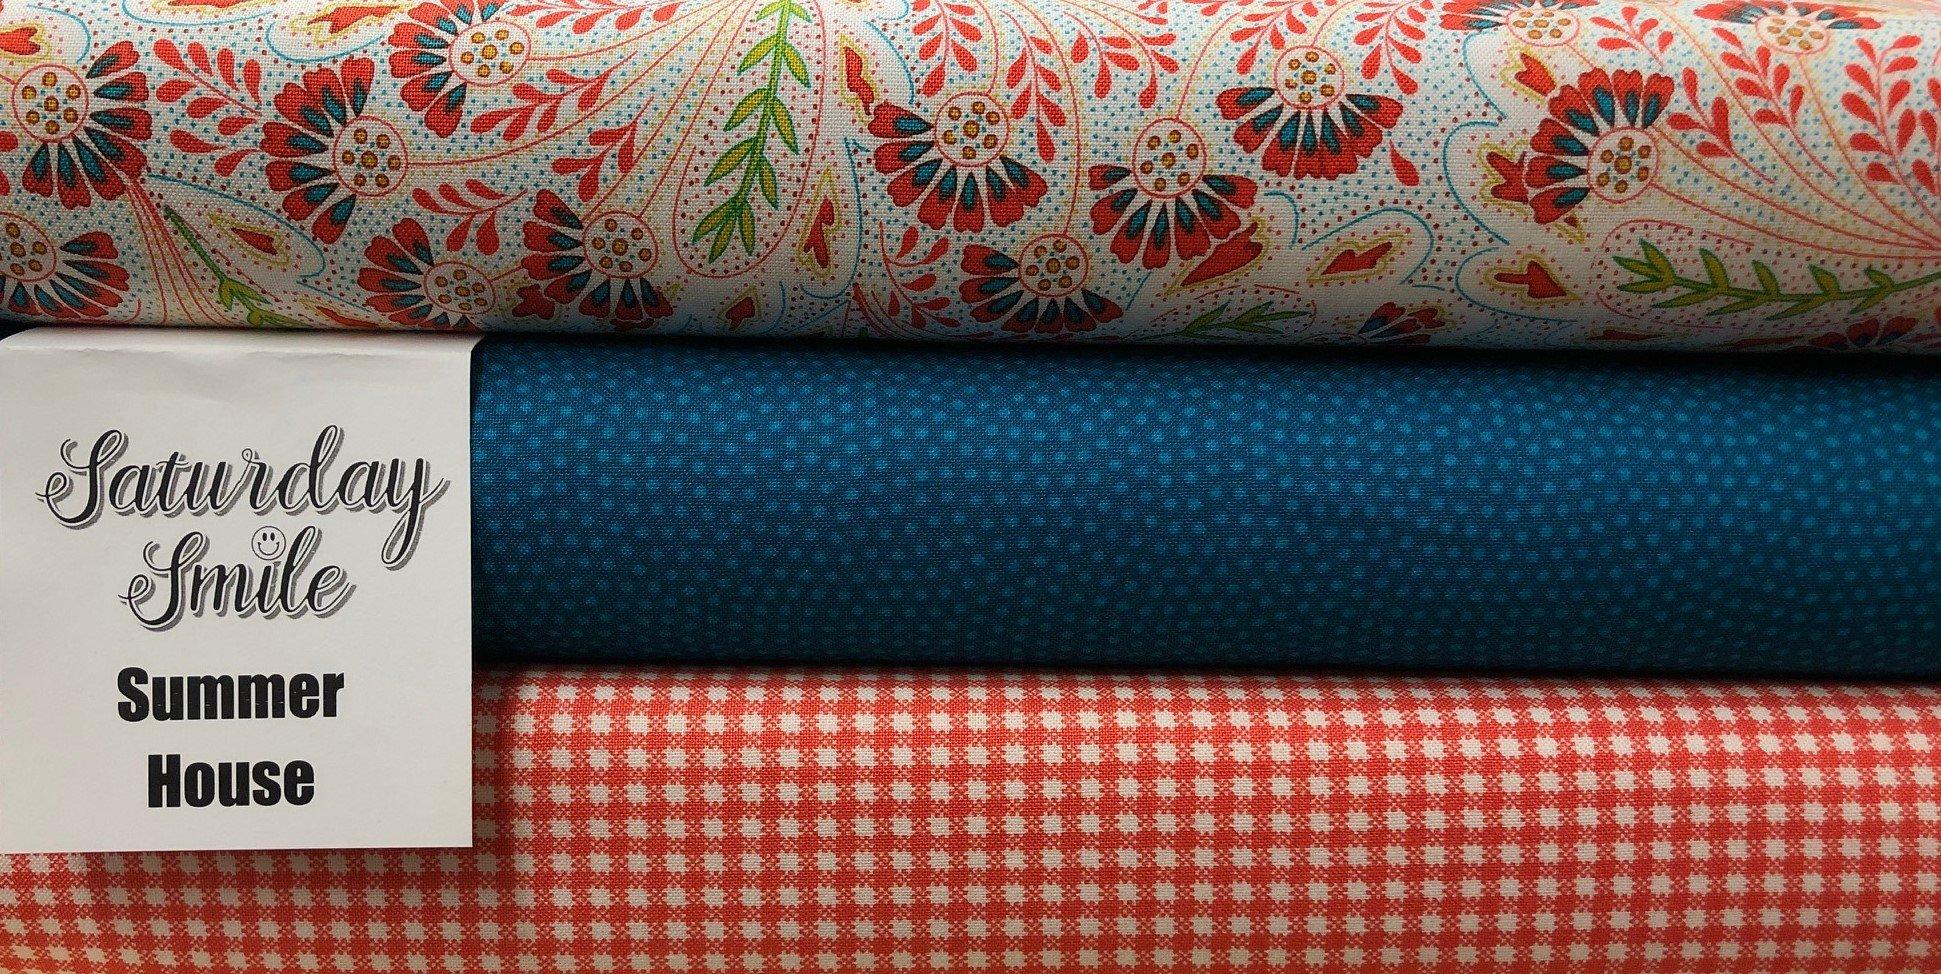 Summer House 3-Yard Quilt Kit